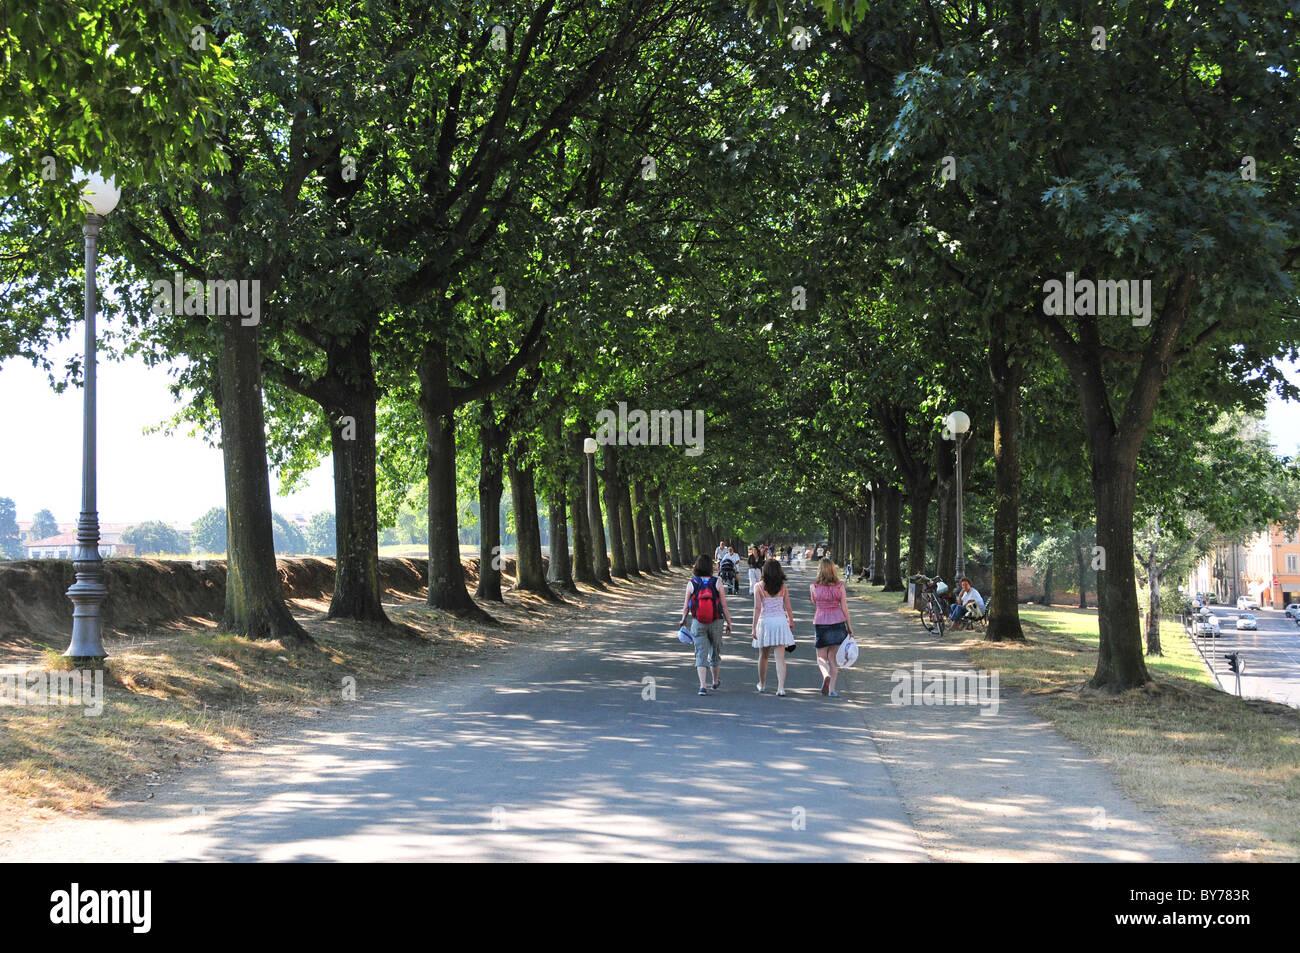 Schattigen Spaziergang entlang der Viale Delle Mura Urbane, Lucca Stockbild